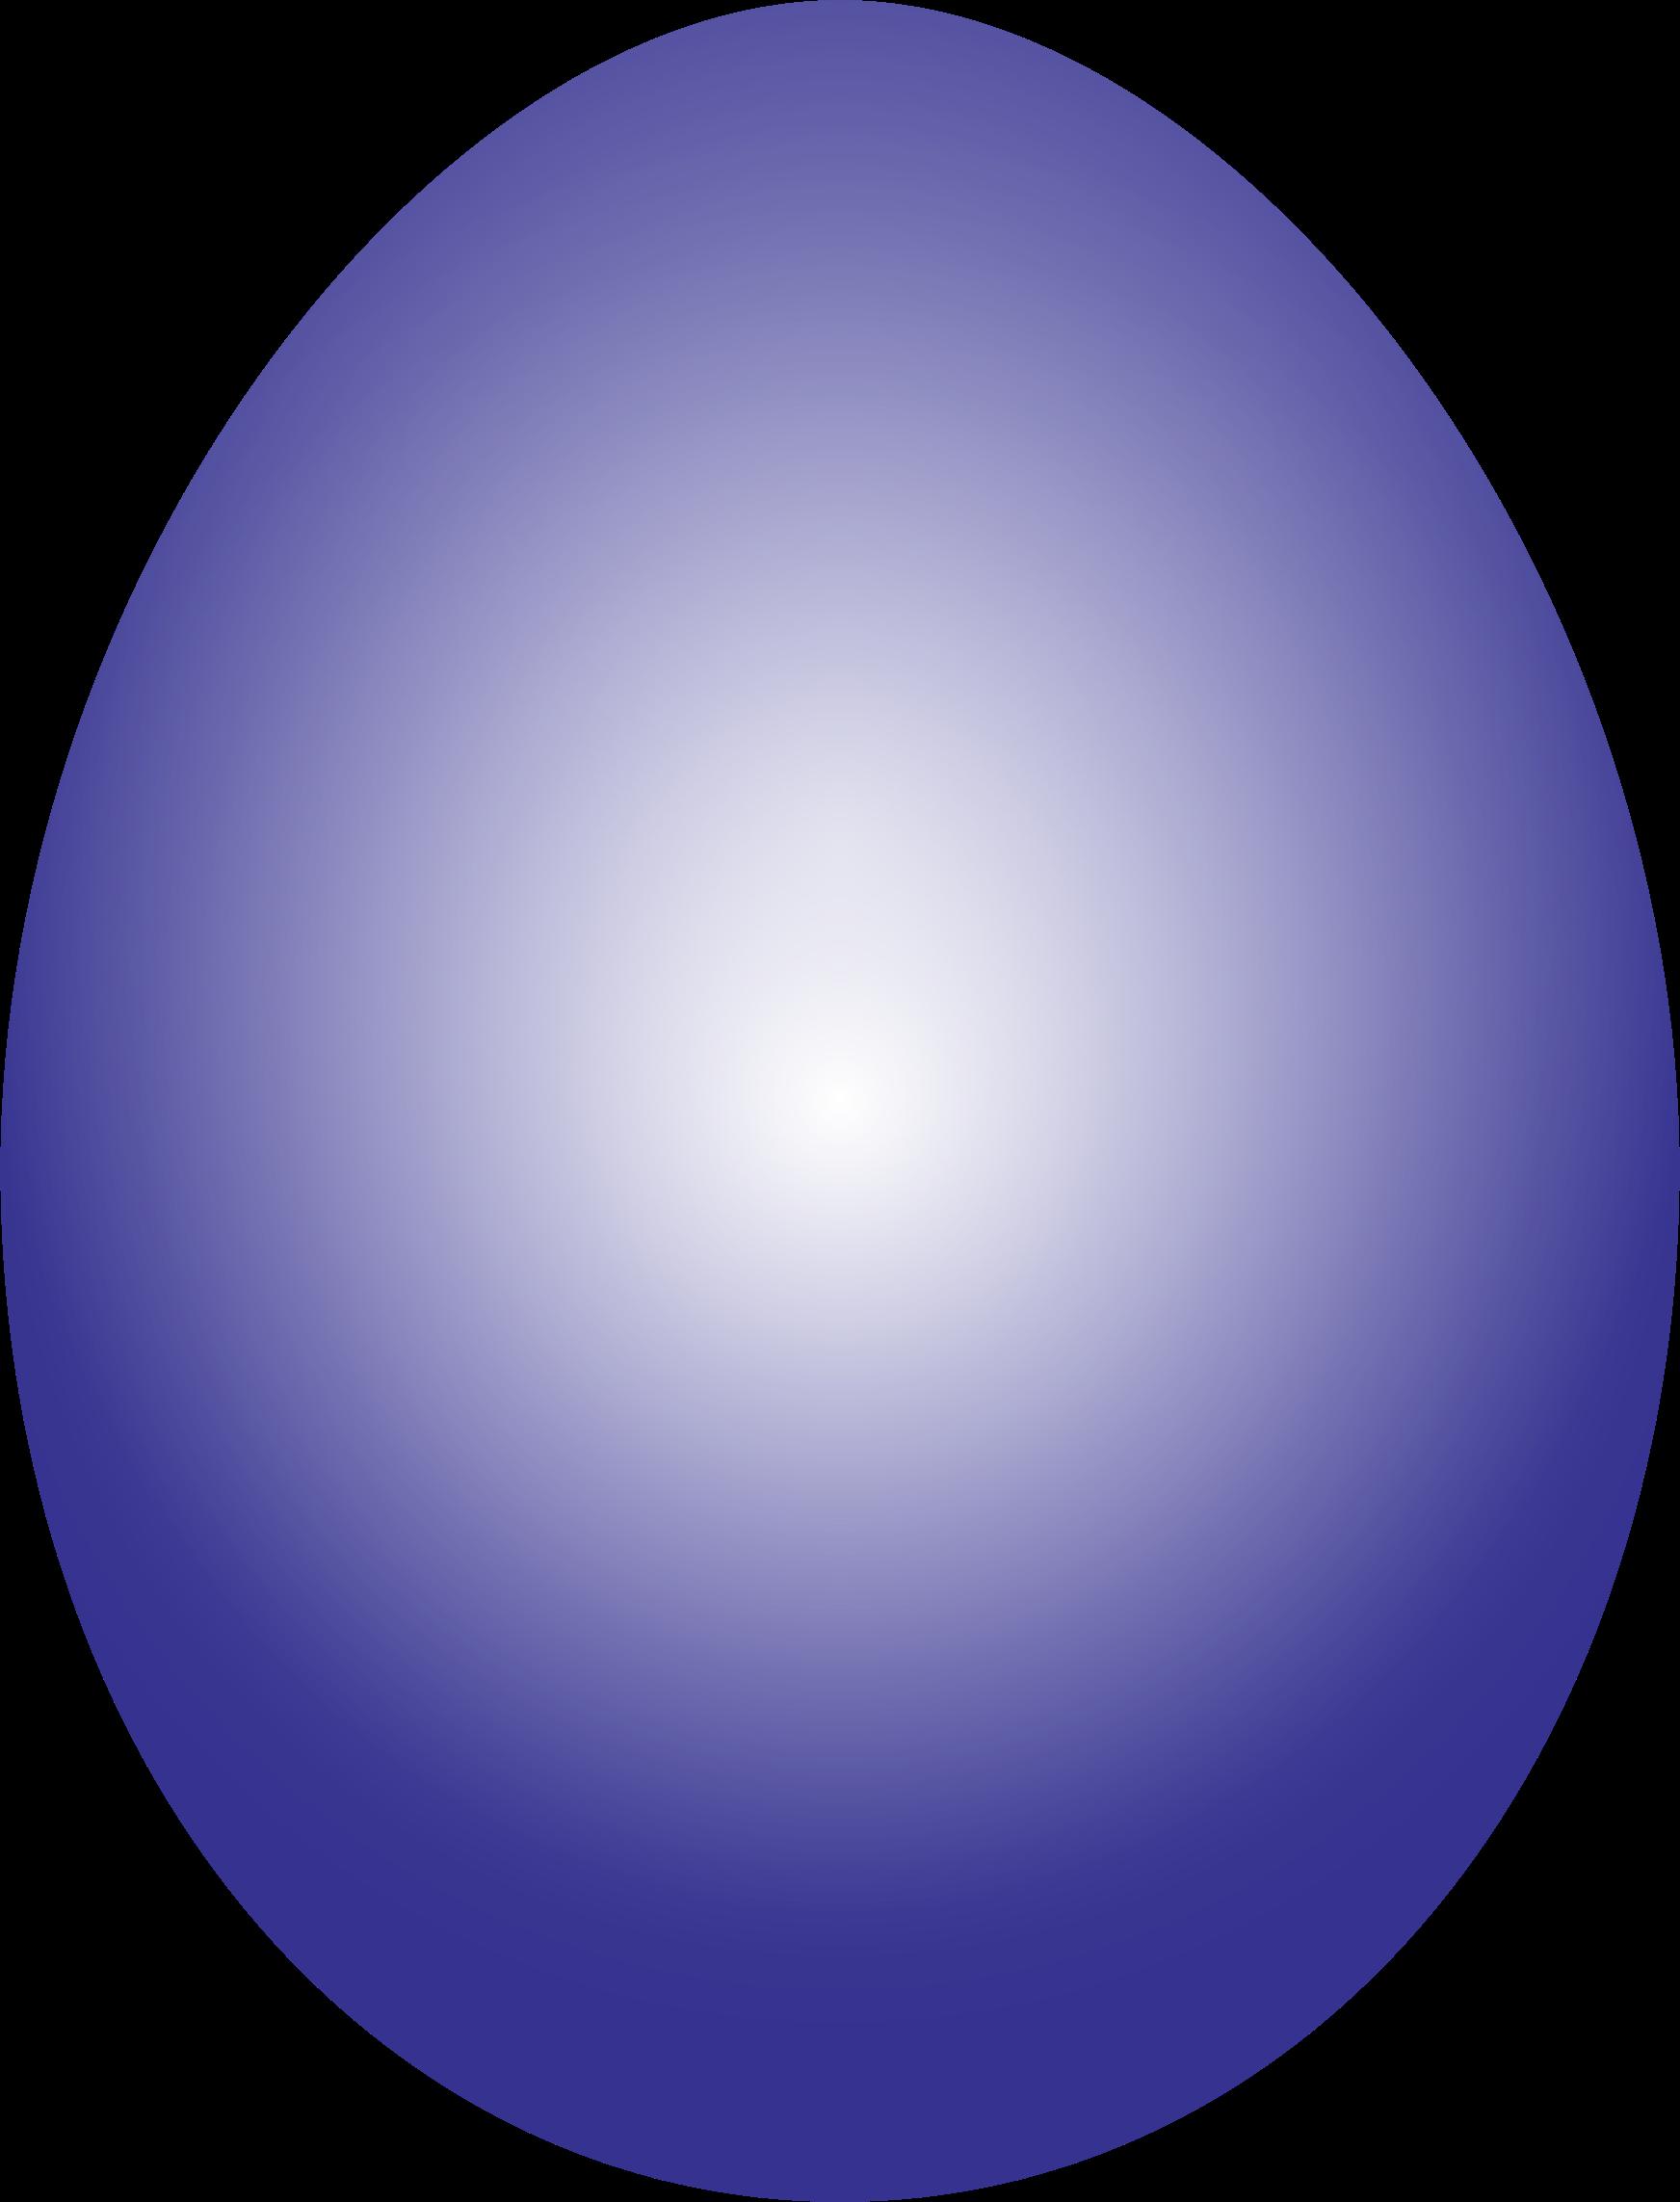 Easter egg big image. Clipart football purple